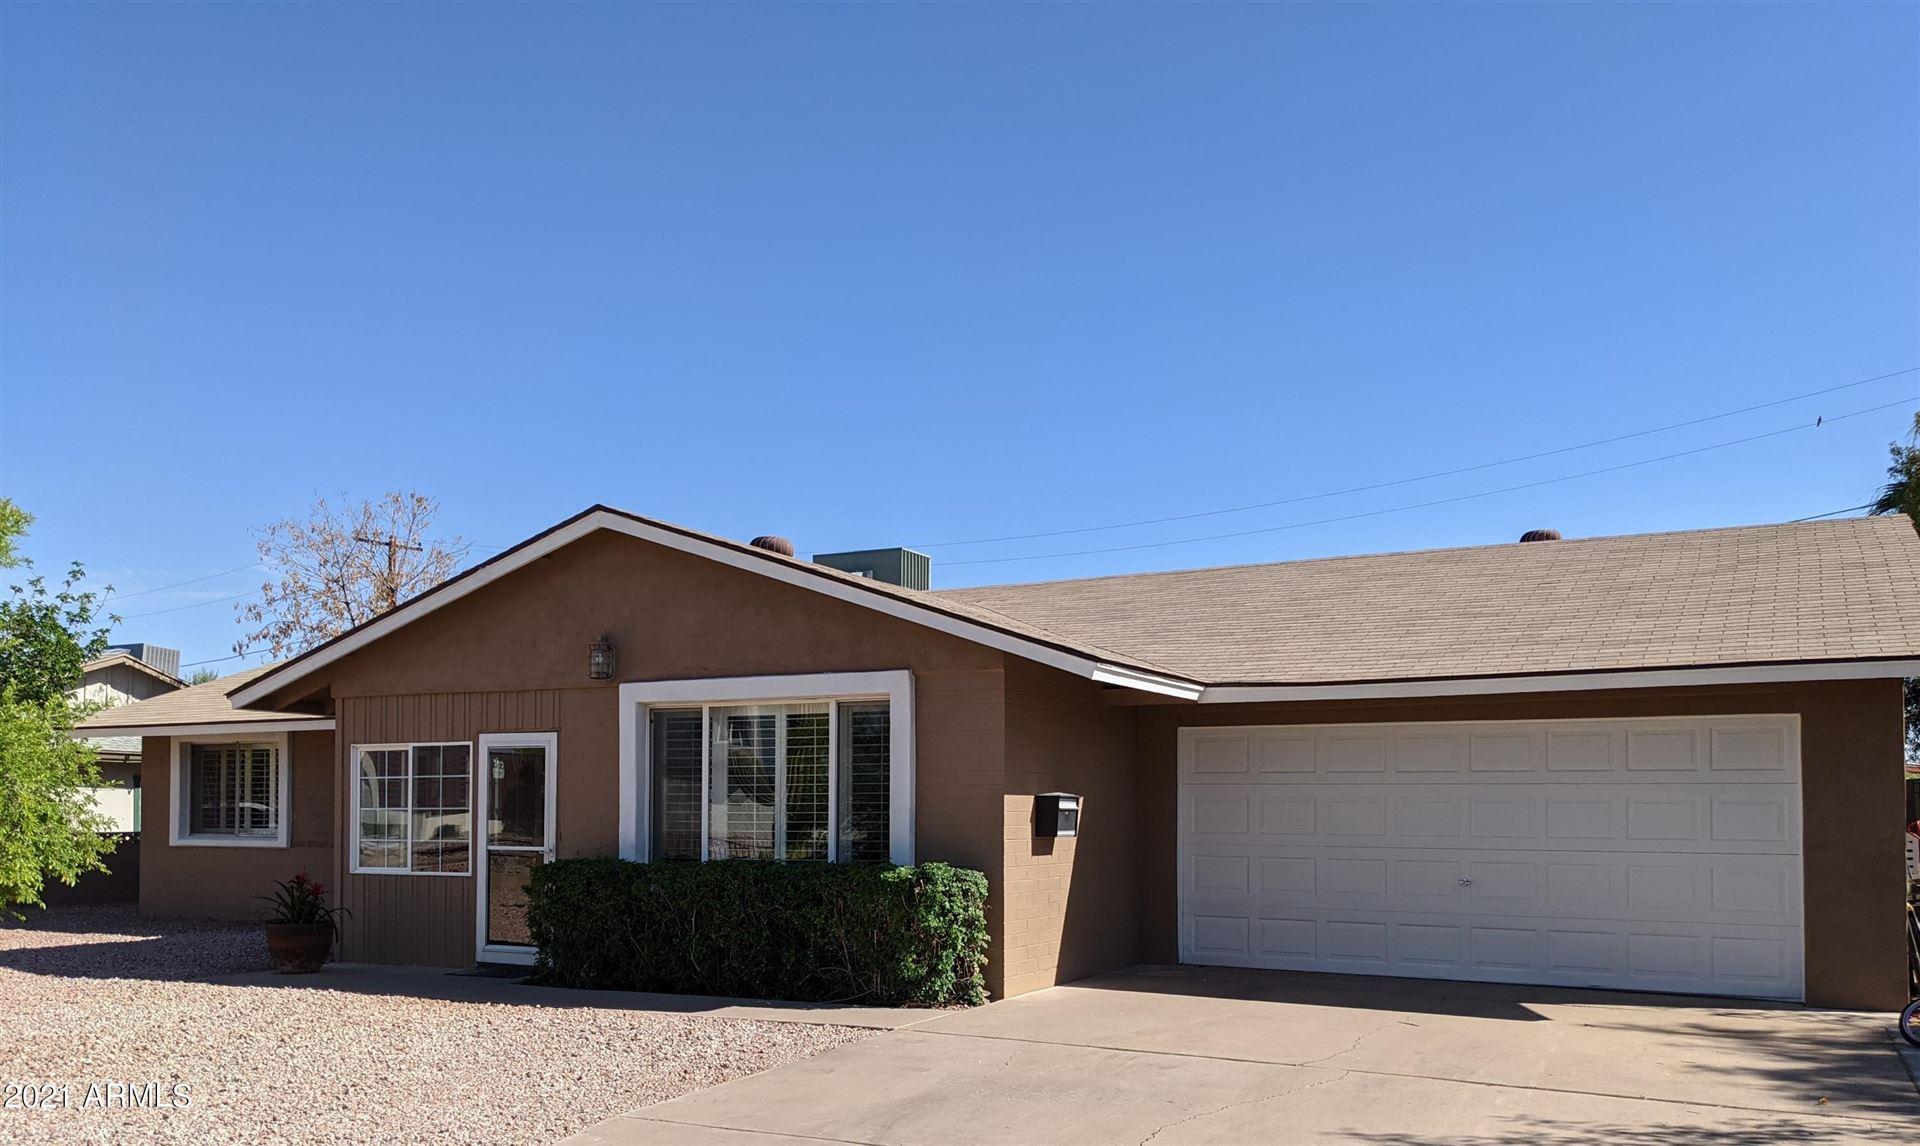 603 E MCKELLIPS Road, Tempe, AZ 85281 - MLS#: 6231898